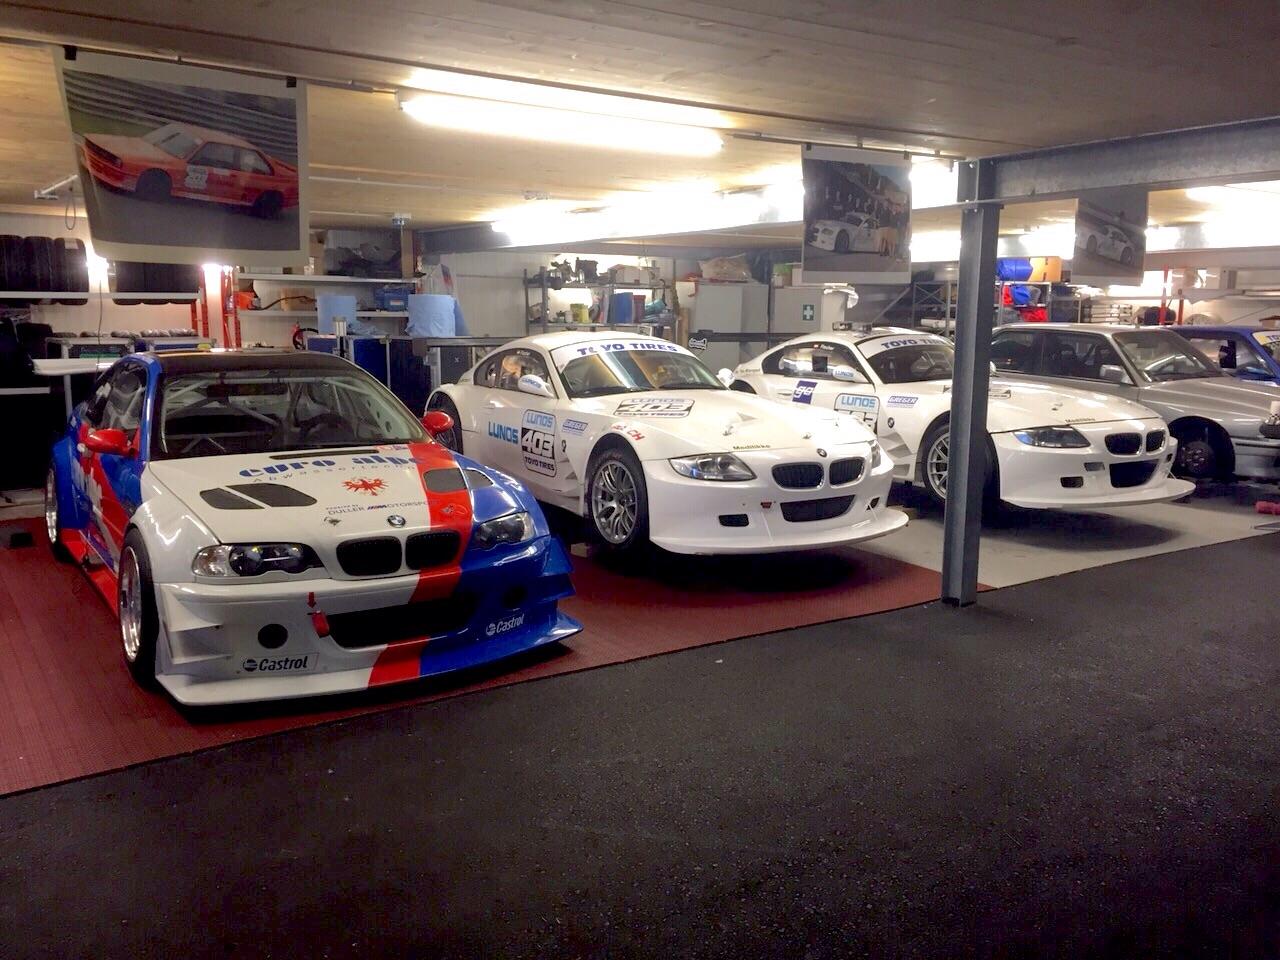 Racing Garage Of A Friend E46 M3 Gtr E86 Z4 Gt3 E30 M3